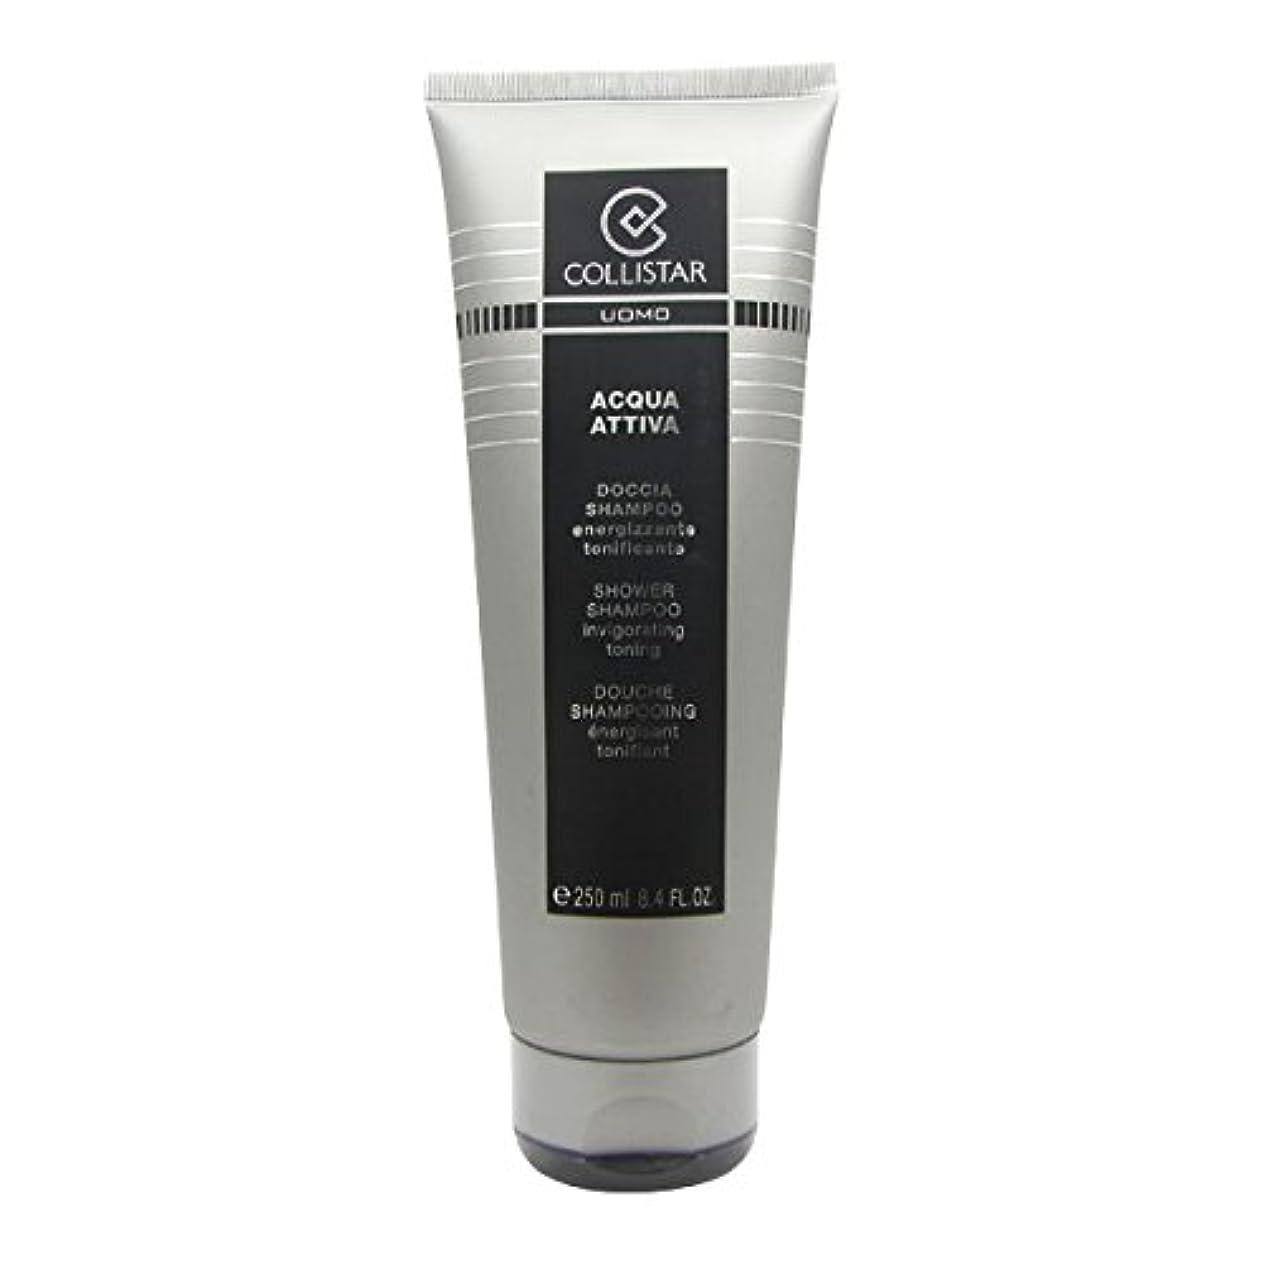 放棄認知緯度Collistar Men Acqua Attiva Shower Shampoo 250ml [並行輸入品]